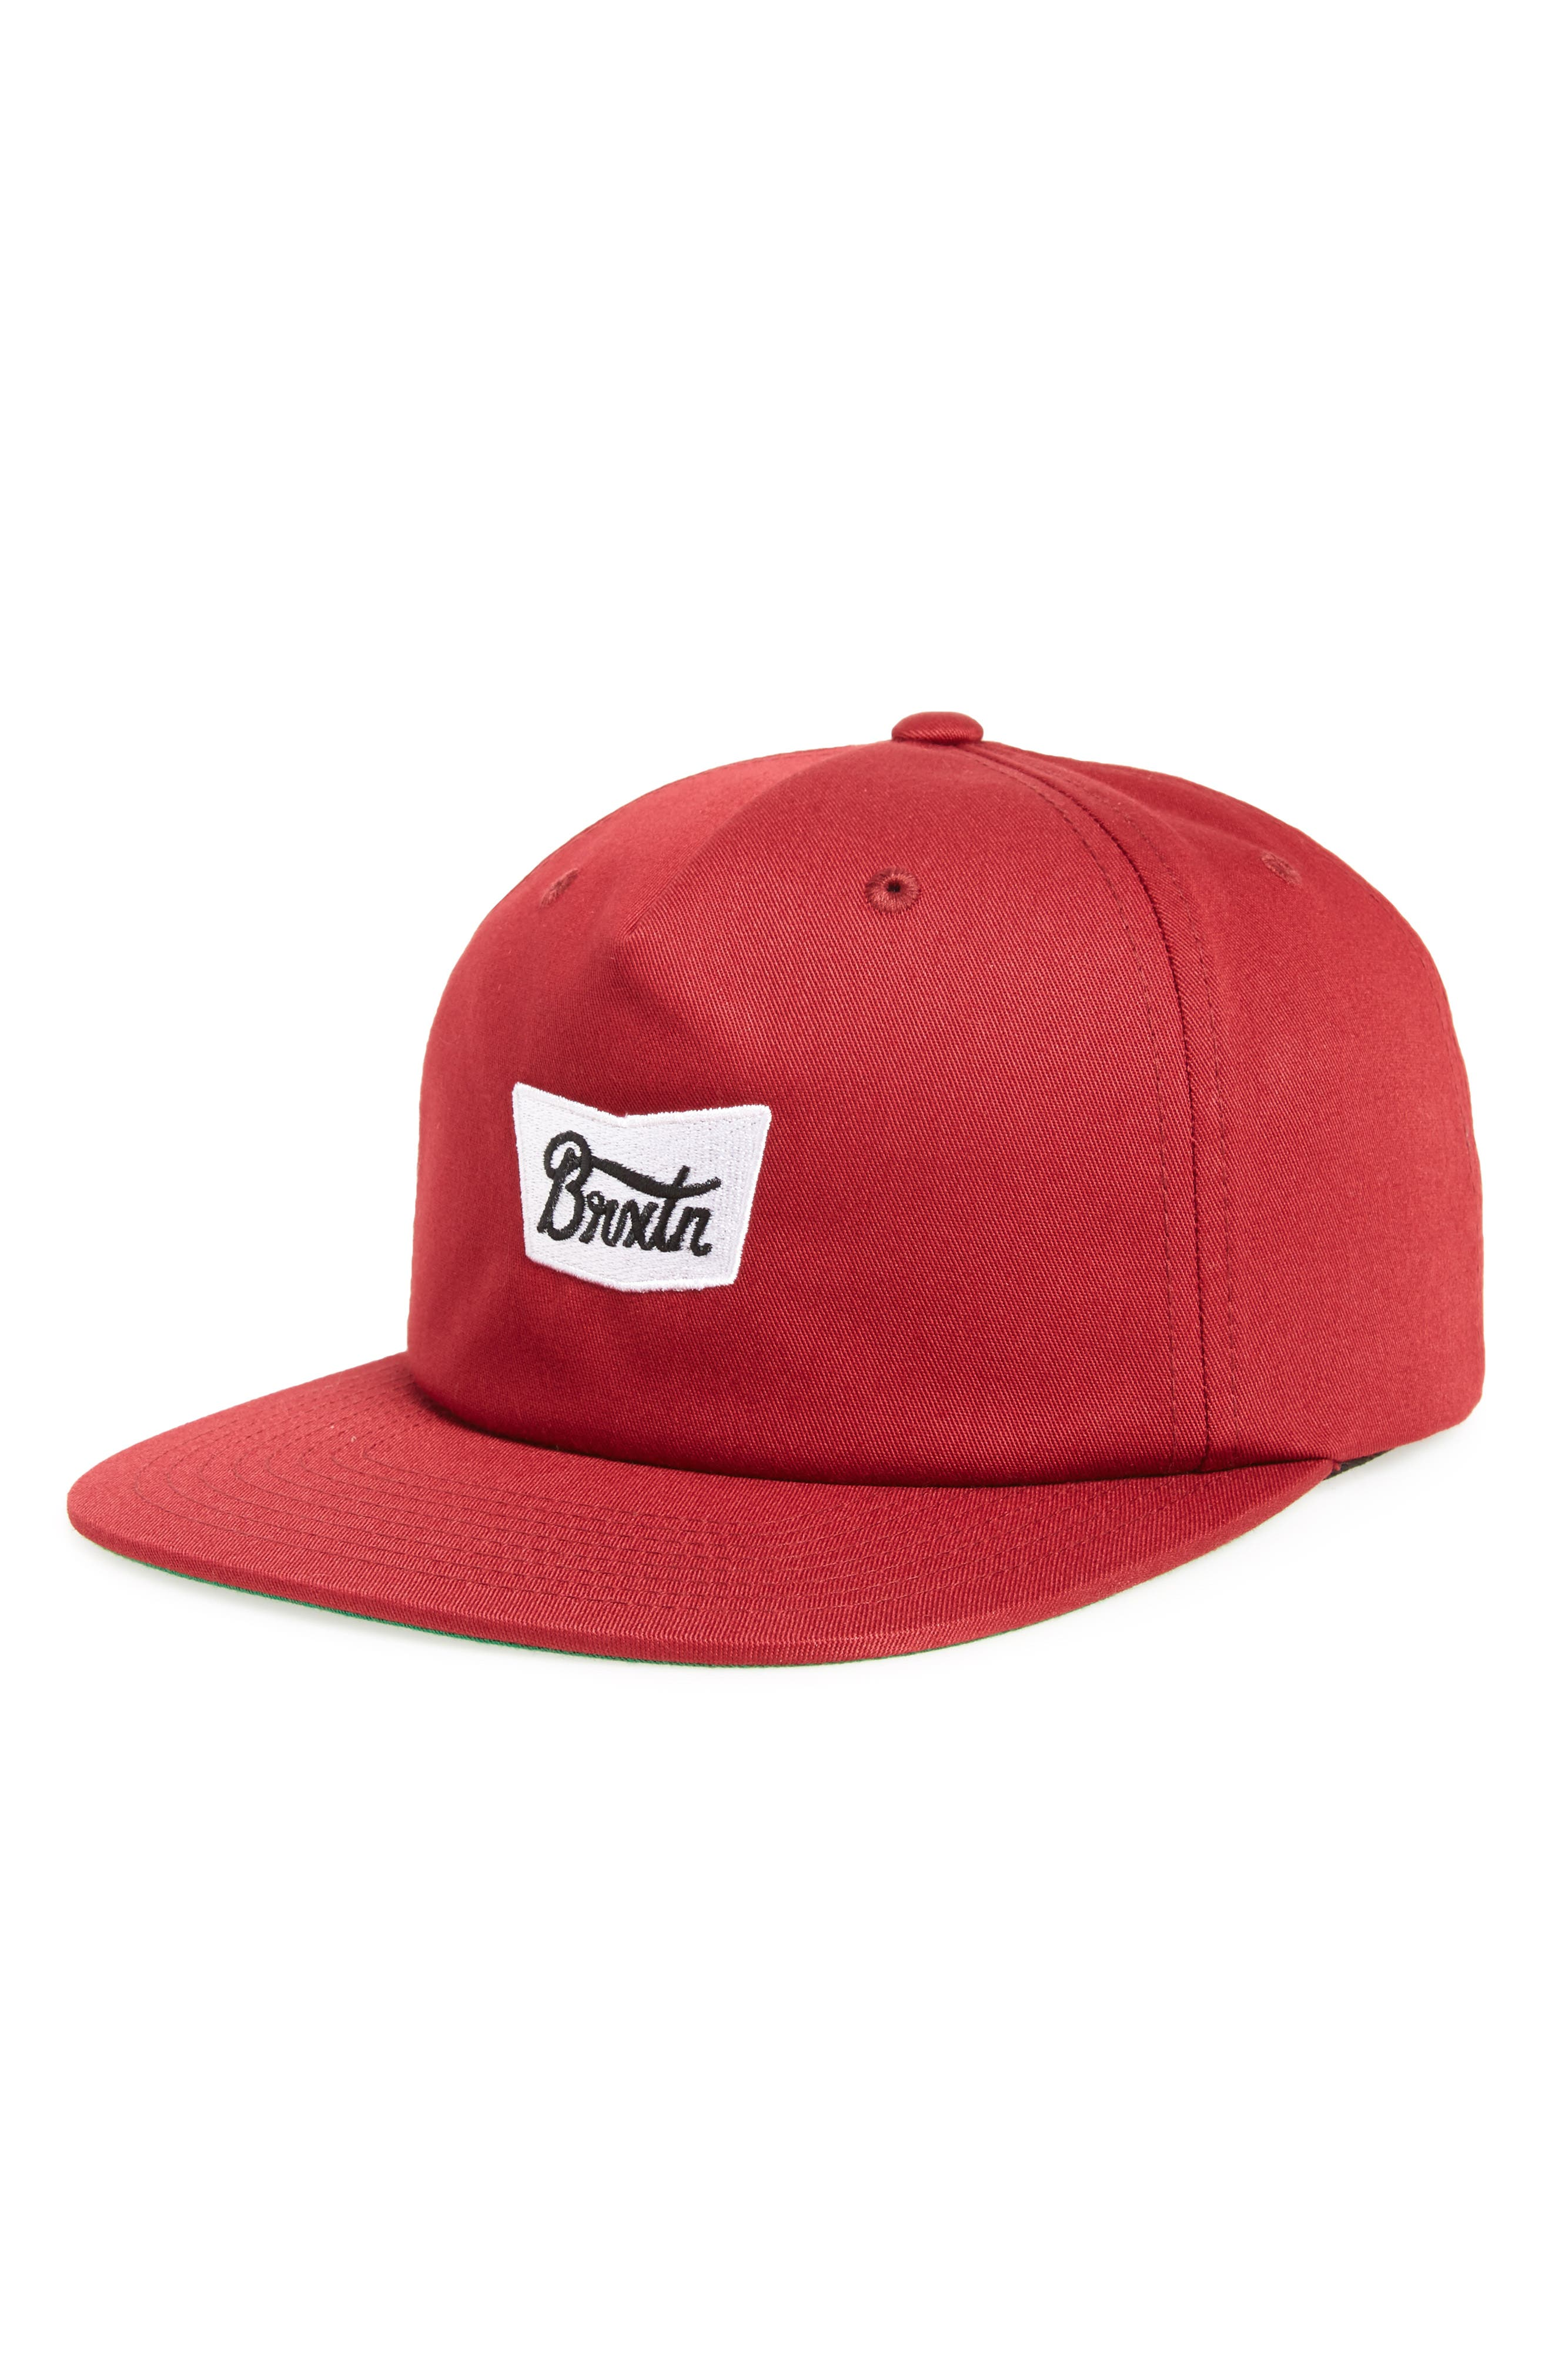 Main Image - Brixton Snapback Baseball Cap